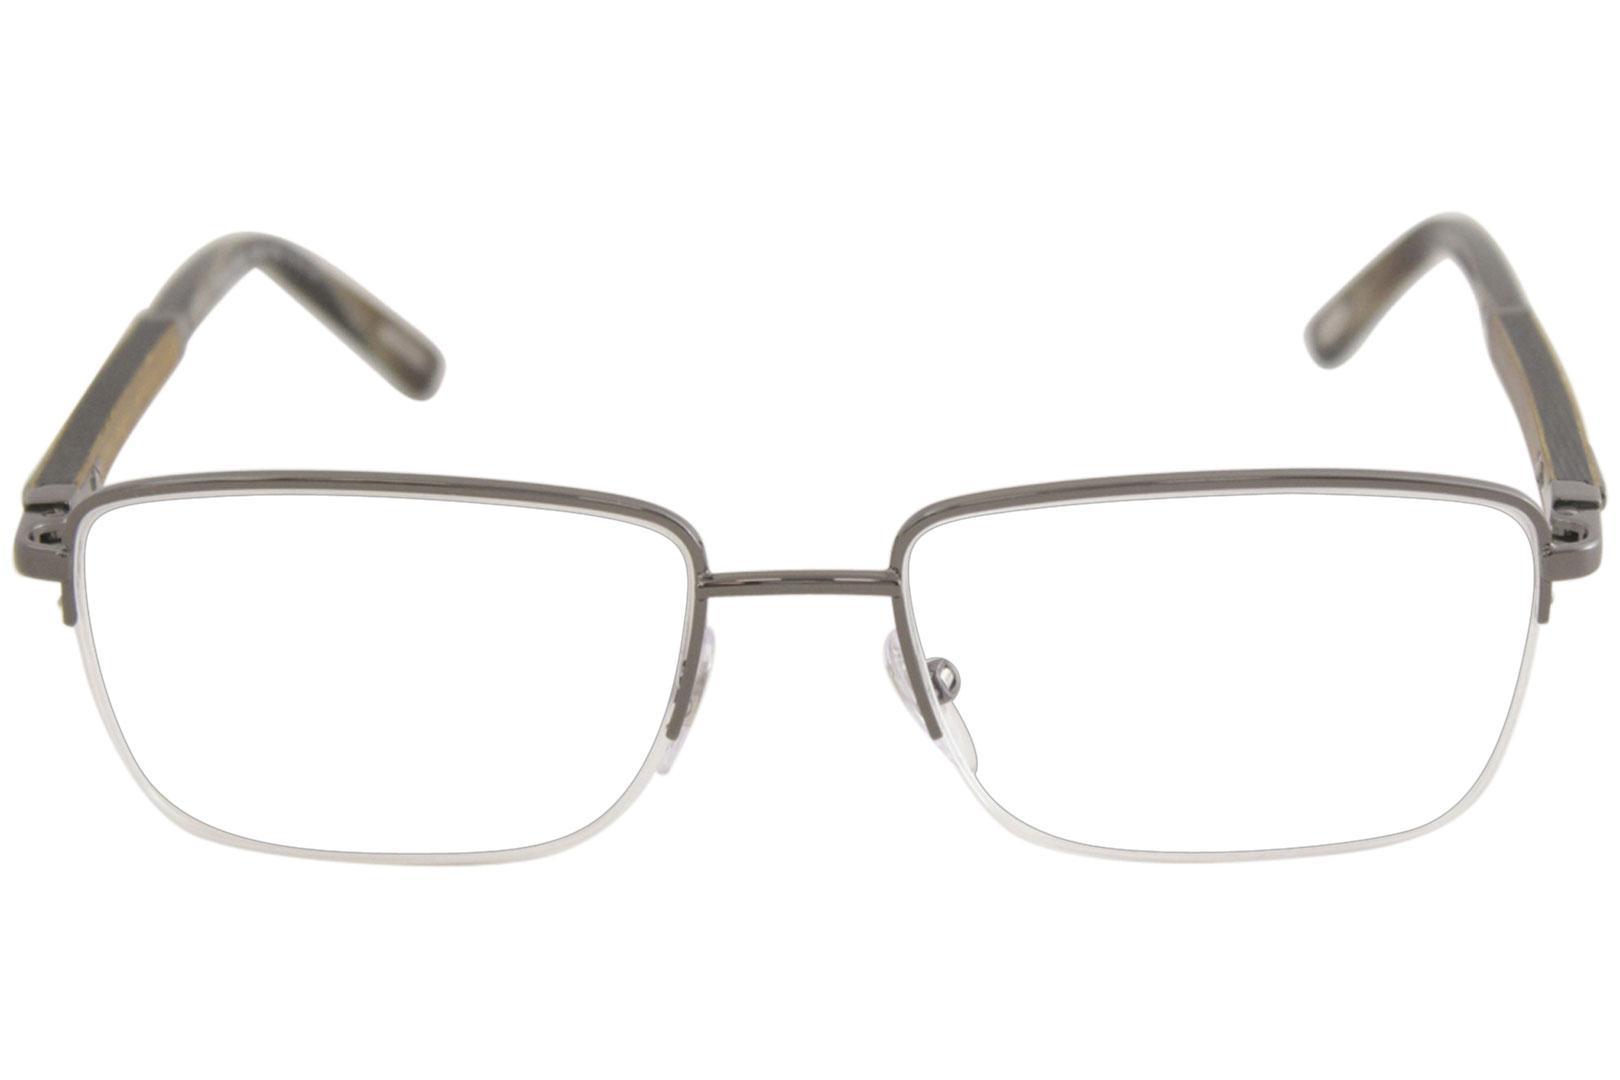 05e5c2b730 Chopard Men s Eyeglasses VCHB75 VCH B75 Half Rim Optical Frame